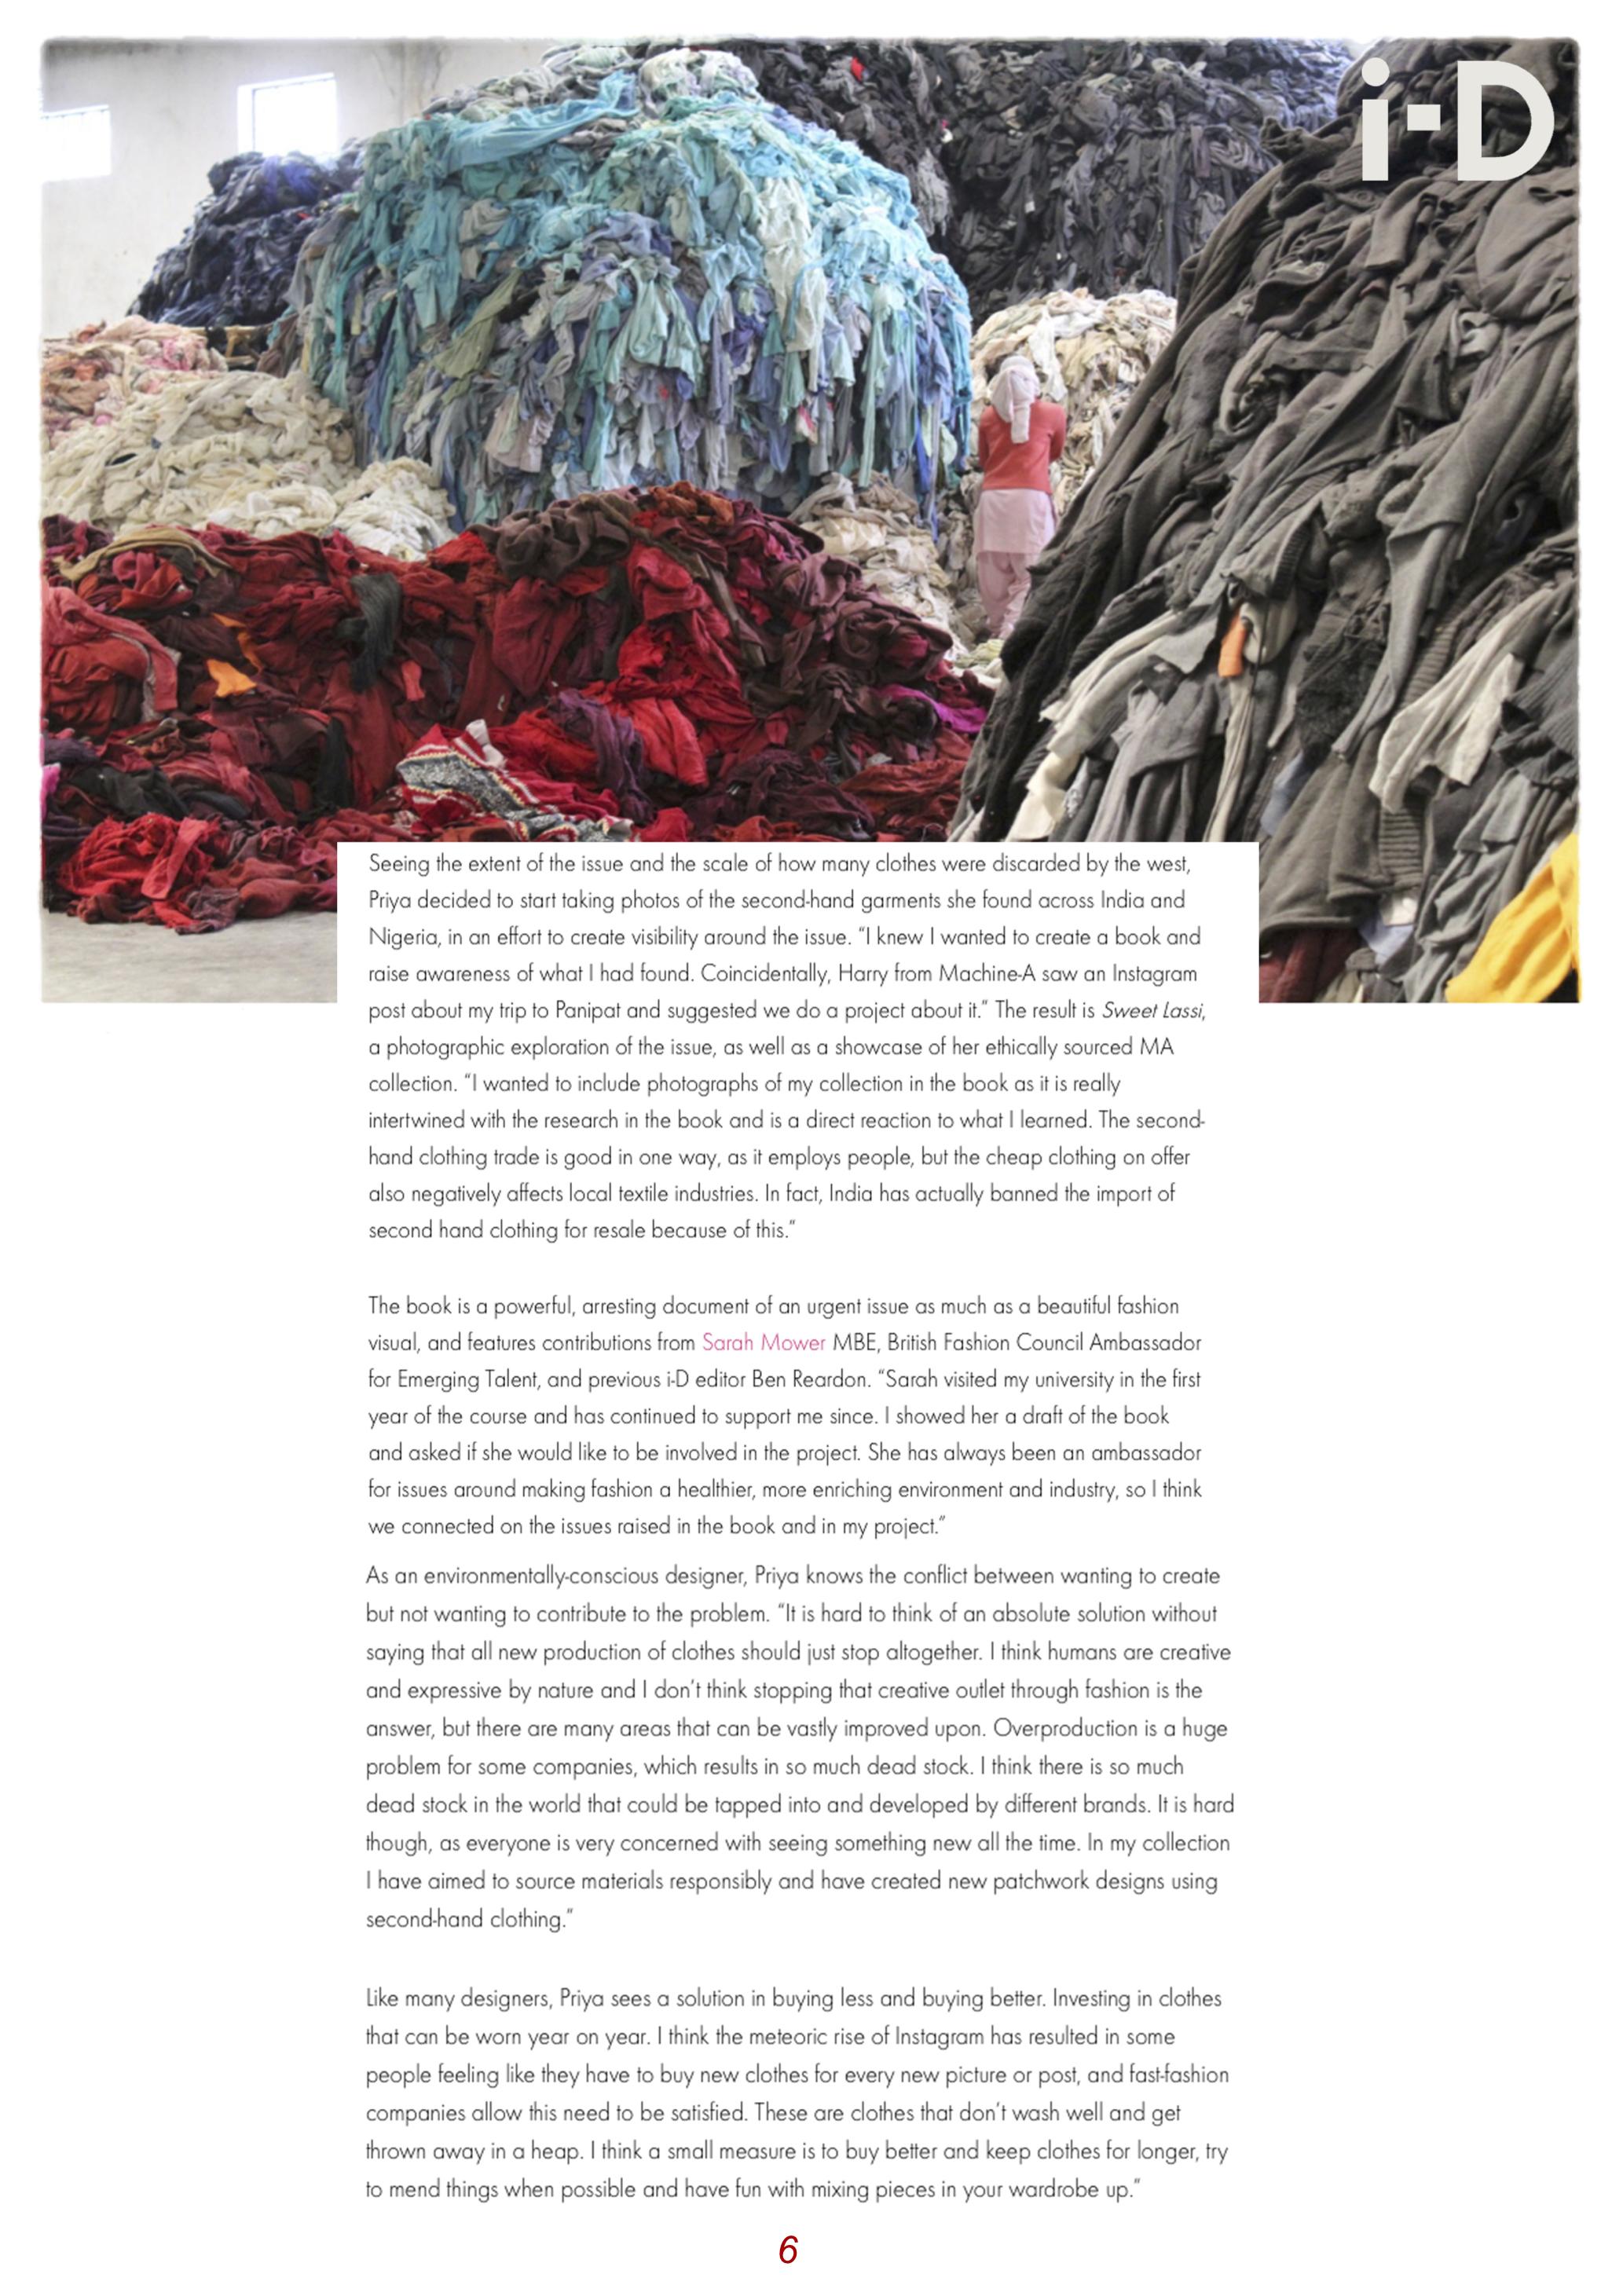 page 6 image.jpg